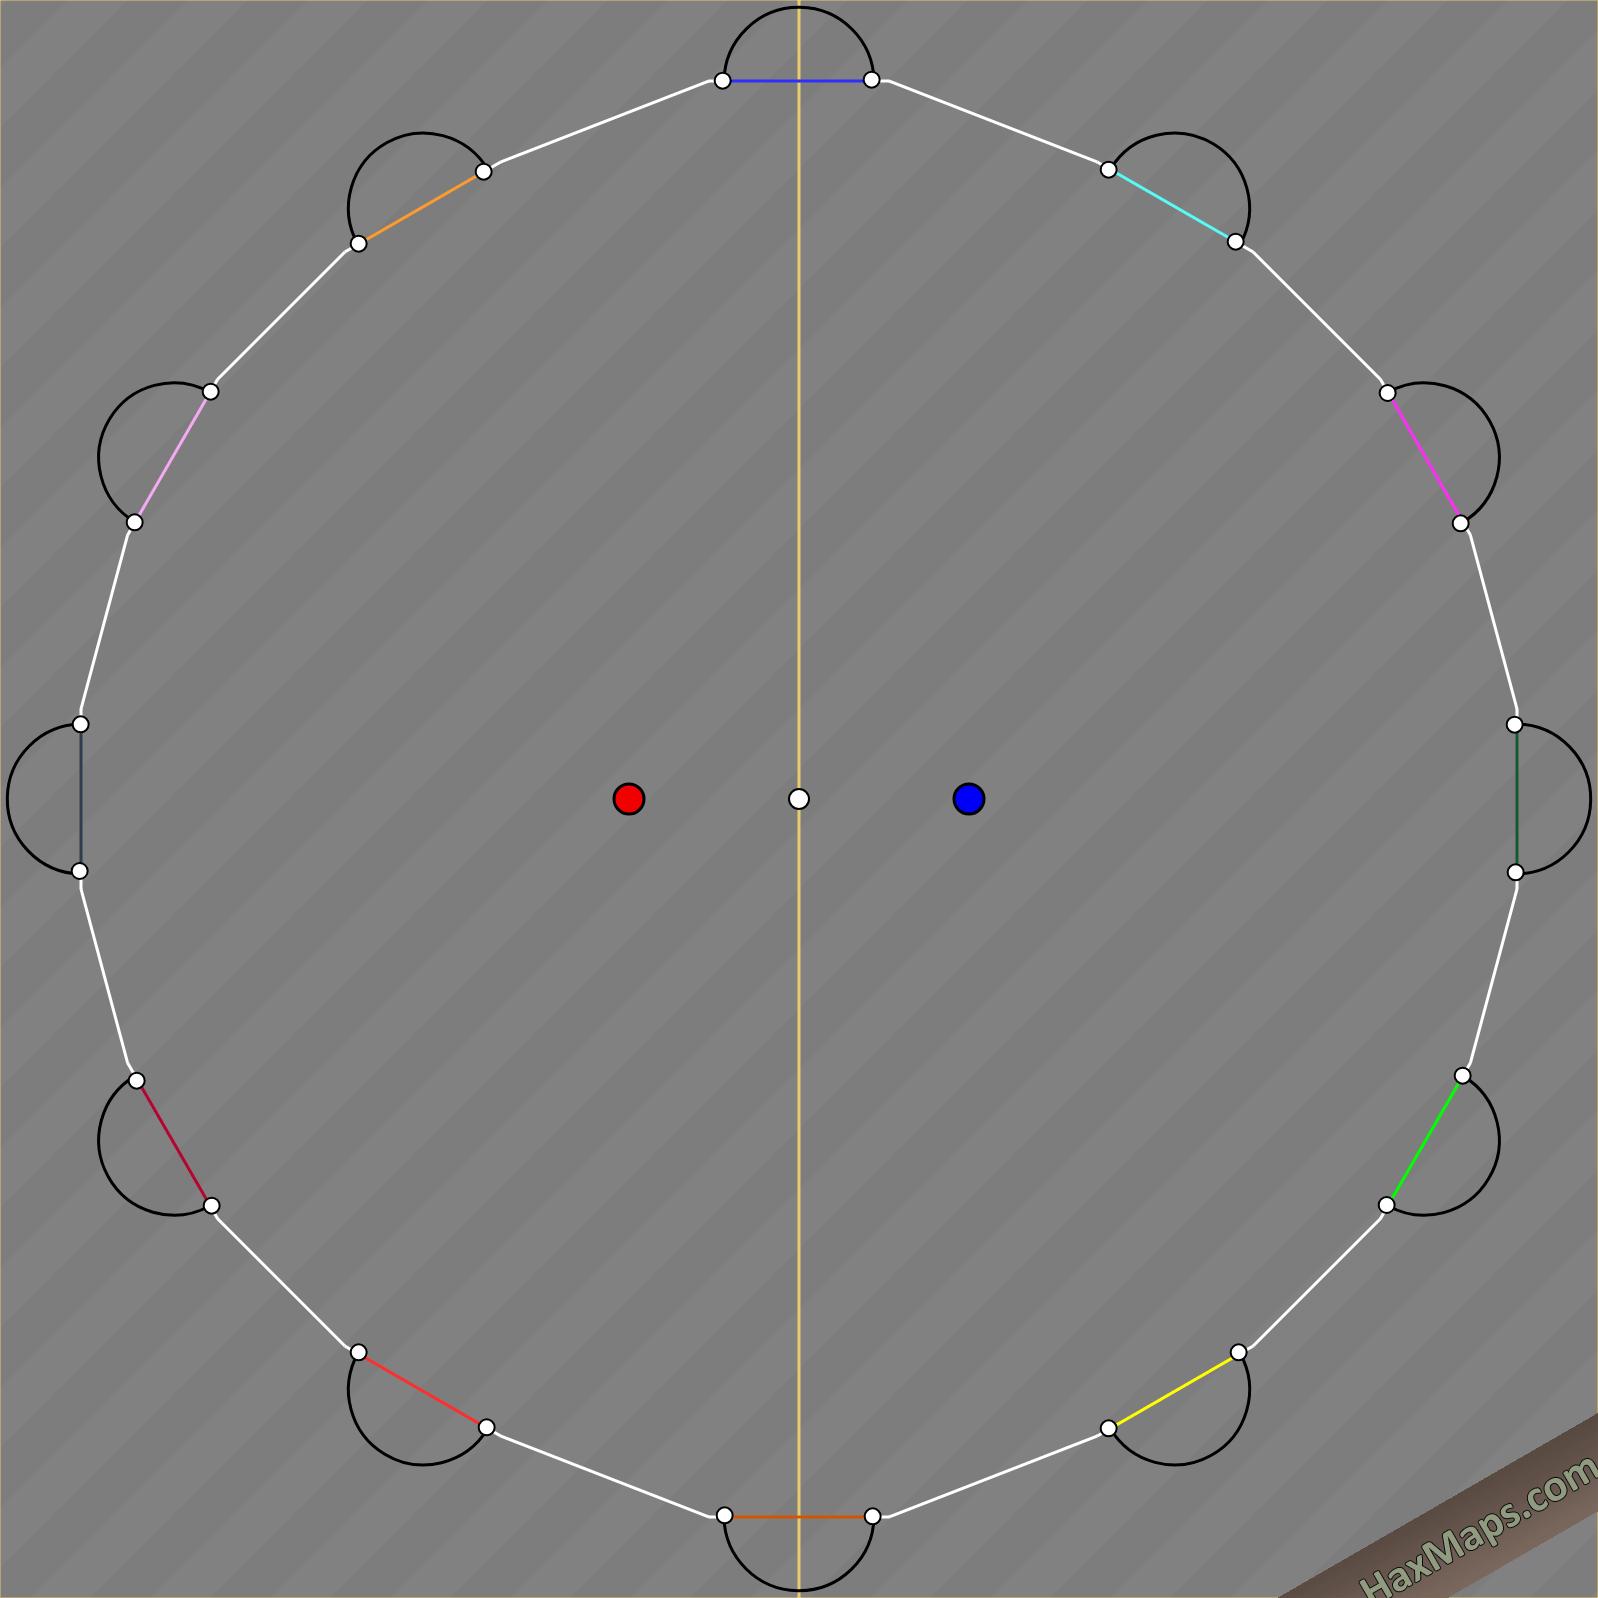 hax ball maps | v12 Japon Kale Full Html Version 2 by Minerva